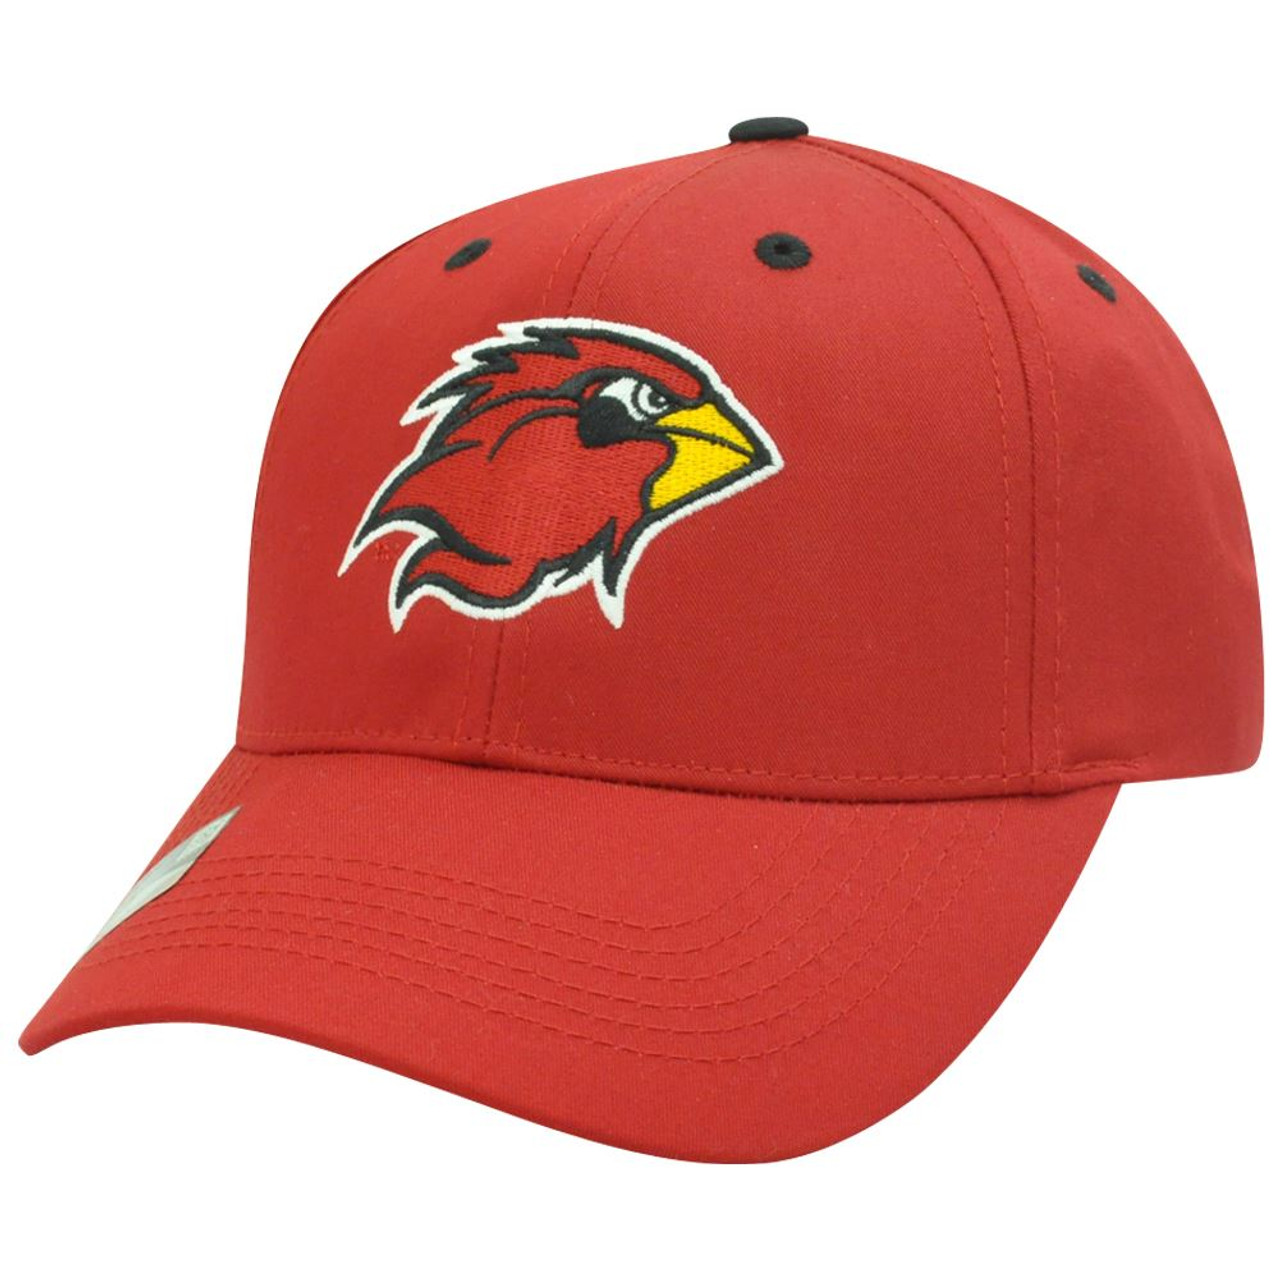 the best attitude 82f86 56a1a NCAA Louisville Cardinals Cards Twill Cotton Adjustable Velcro Plain Red Hat  Cap - Cap Store Online.com